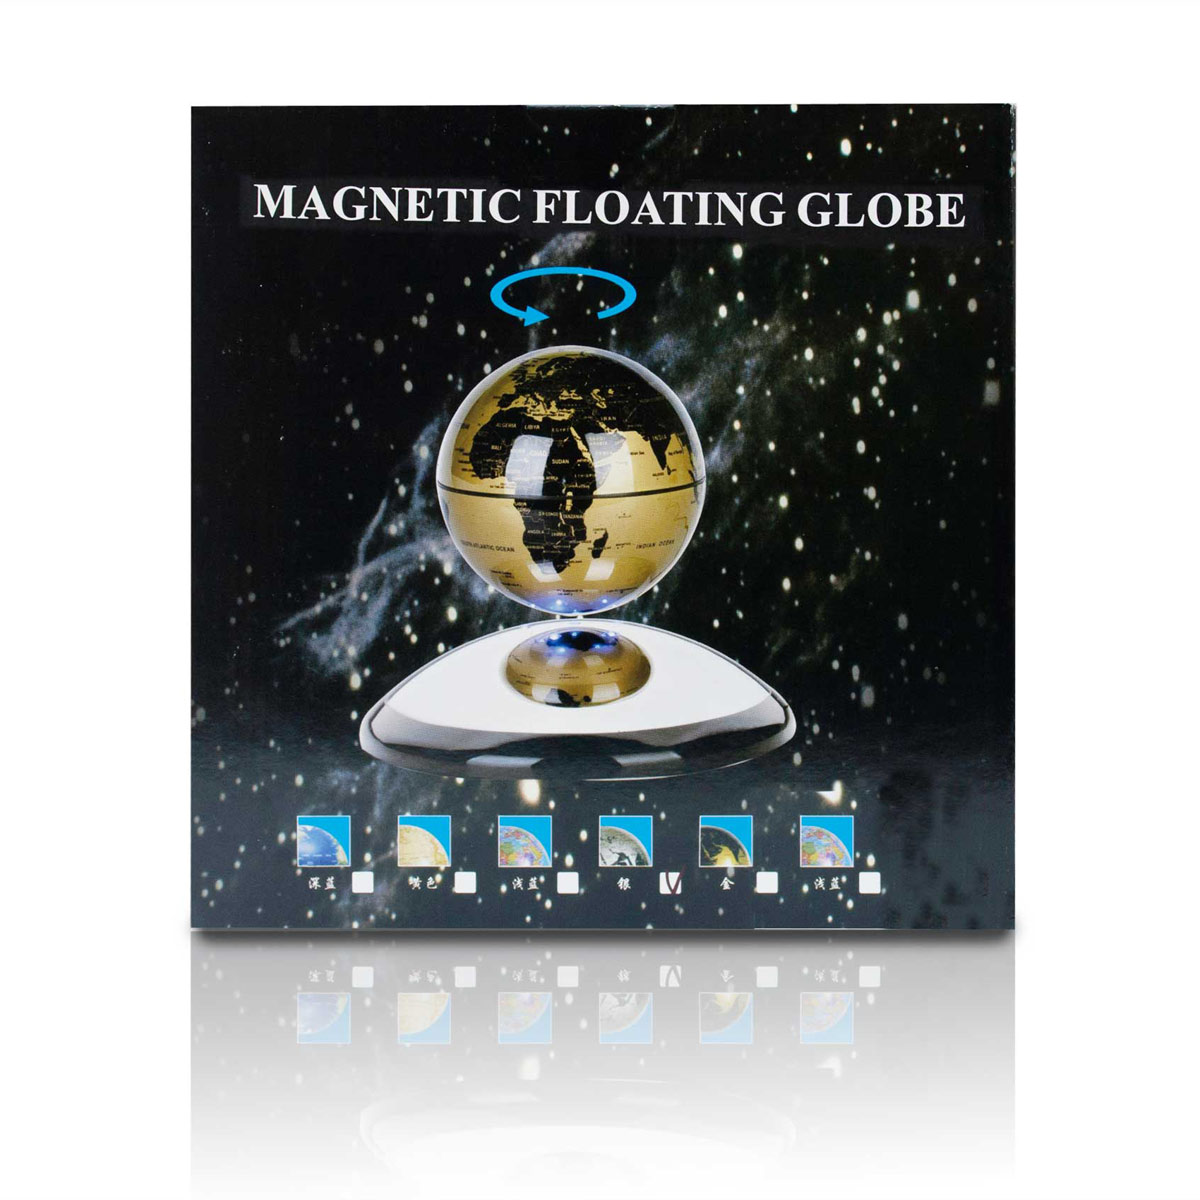 Magischer Frei Schwebender Globus Schwebeglobus Magic Floating Floater Globe